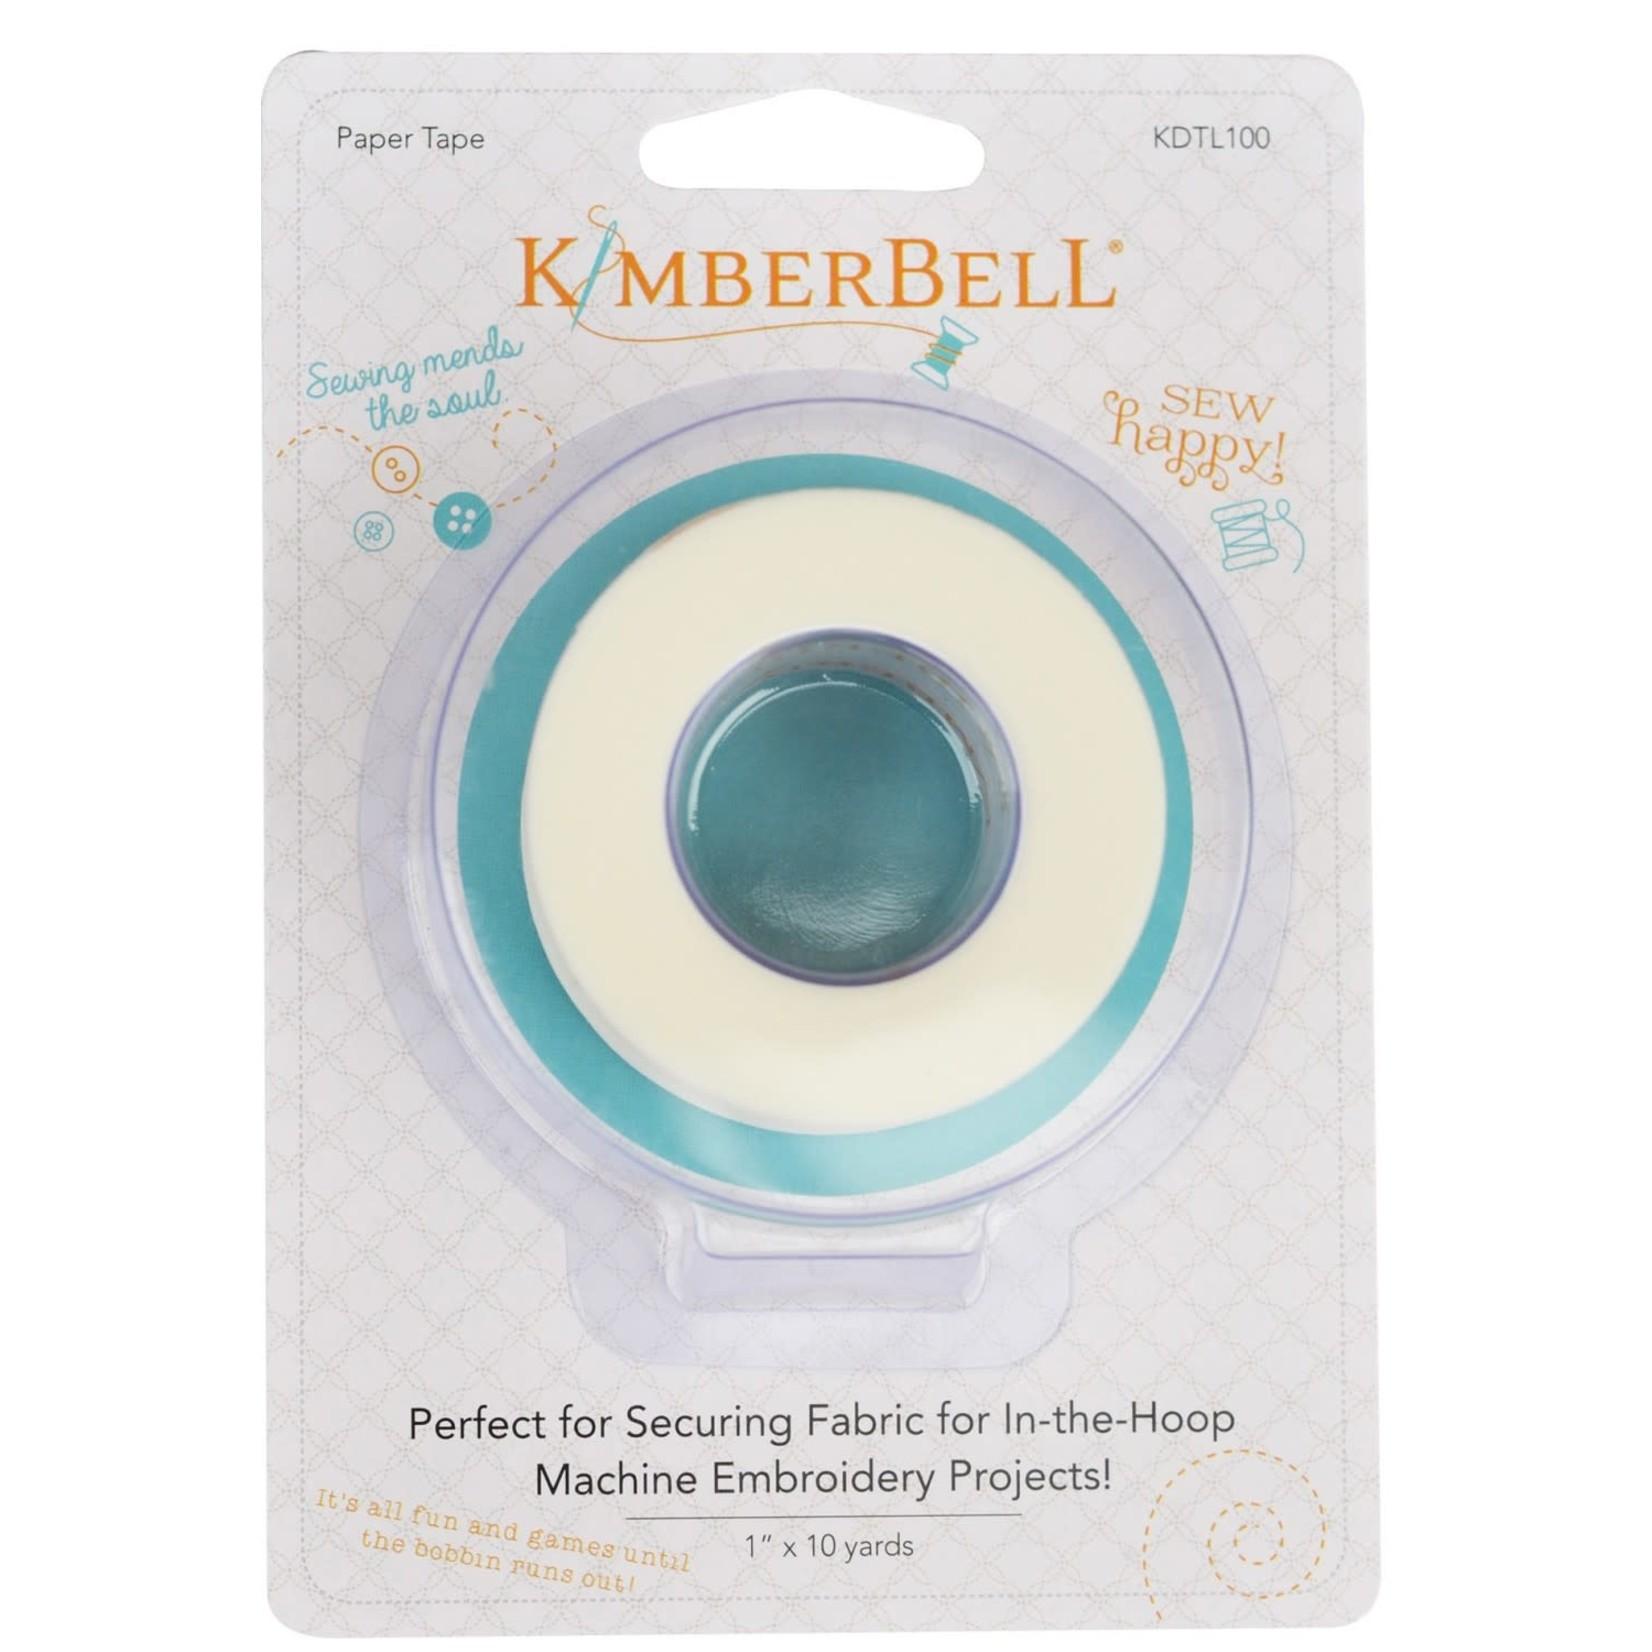 Kimberbell Designs Kimberbell Paper Tape